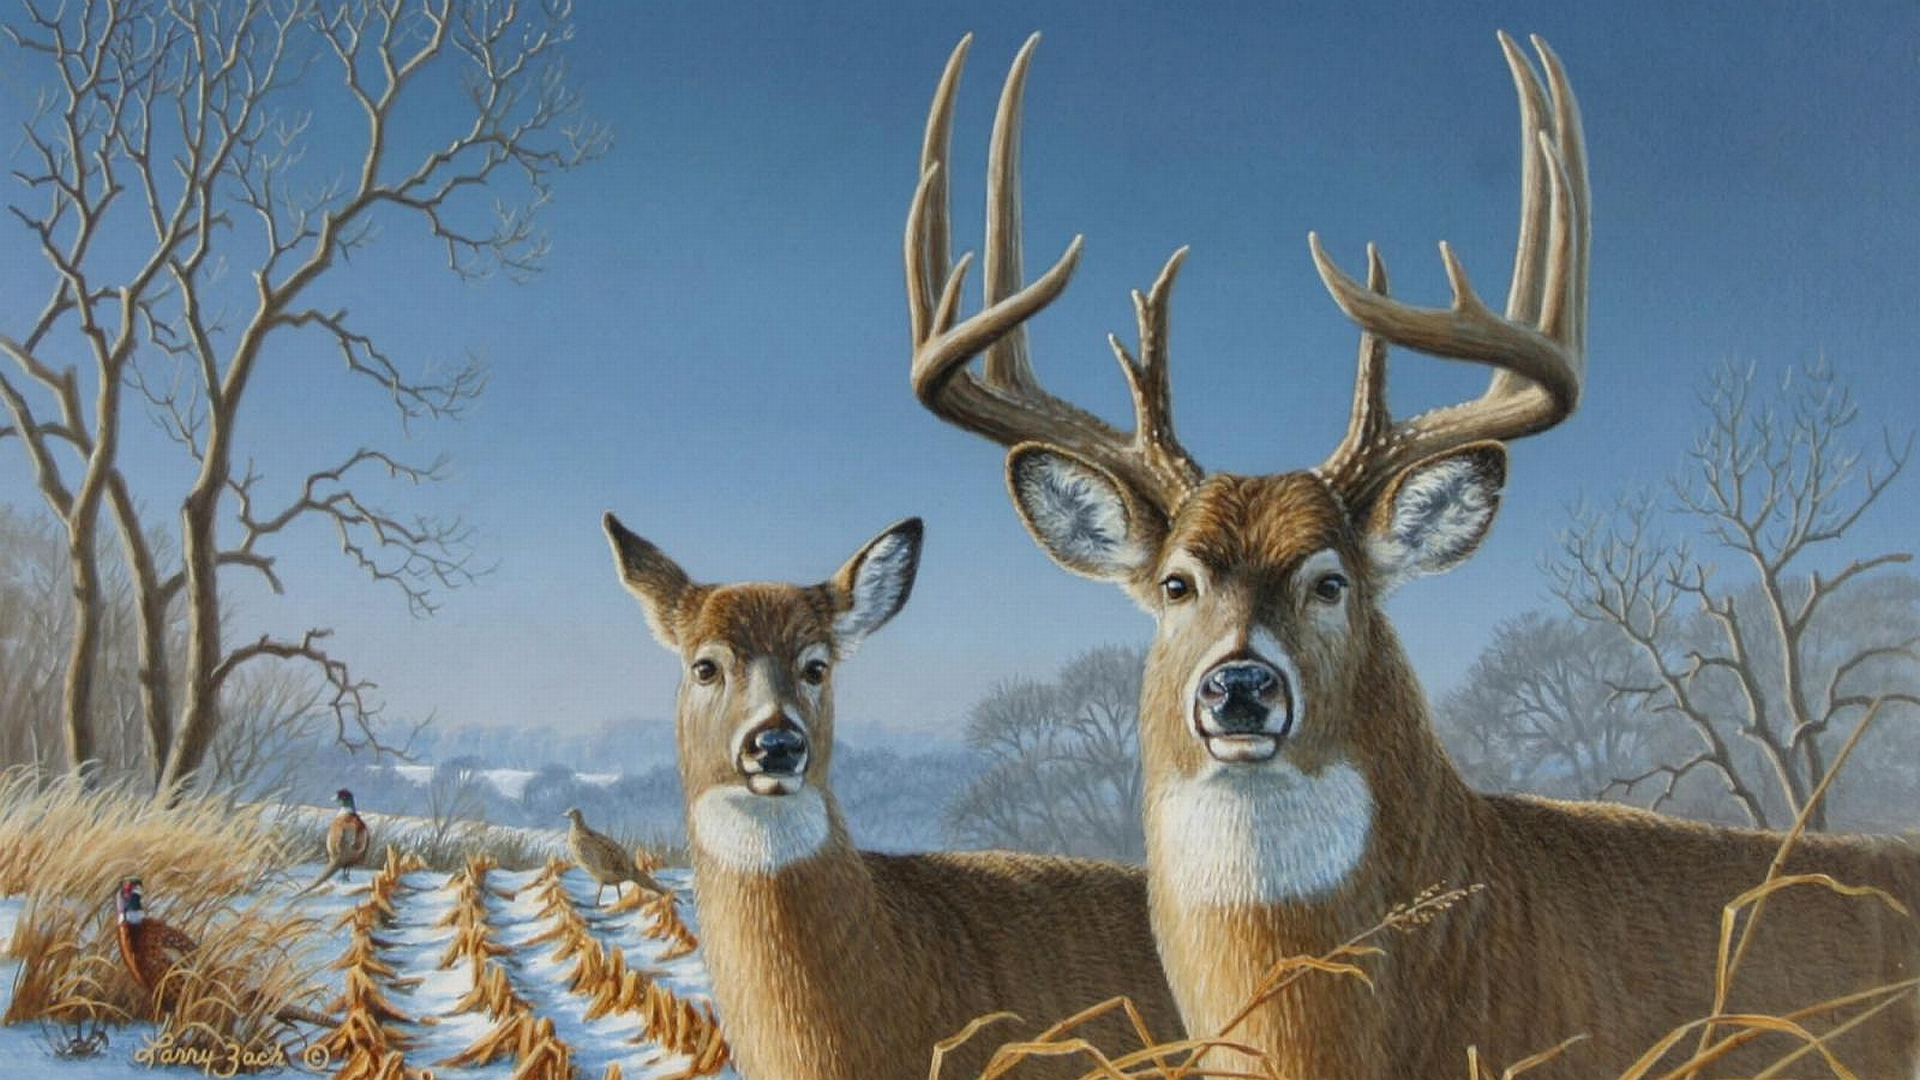 Whitetail Deer Photos For Wallpaper httpwwwpic2flycomWhitetail 1920x1080